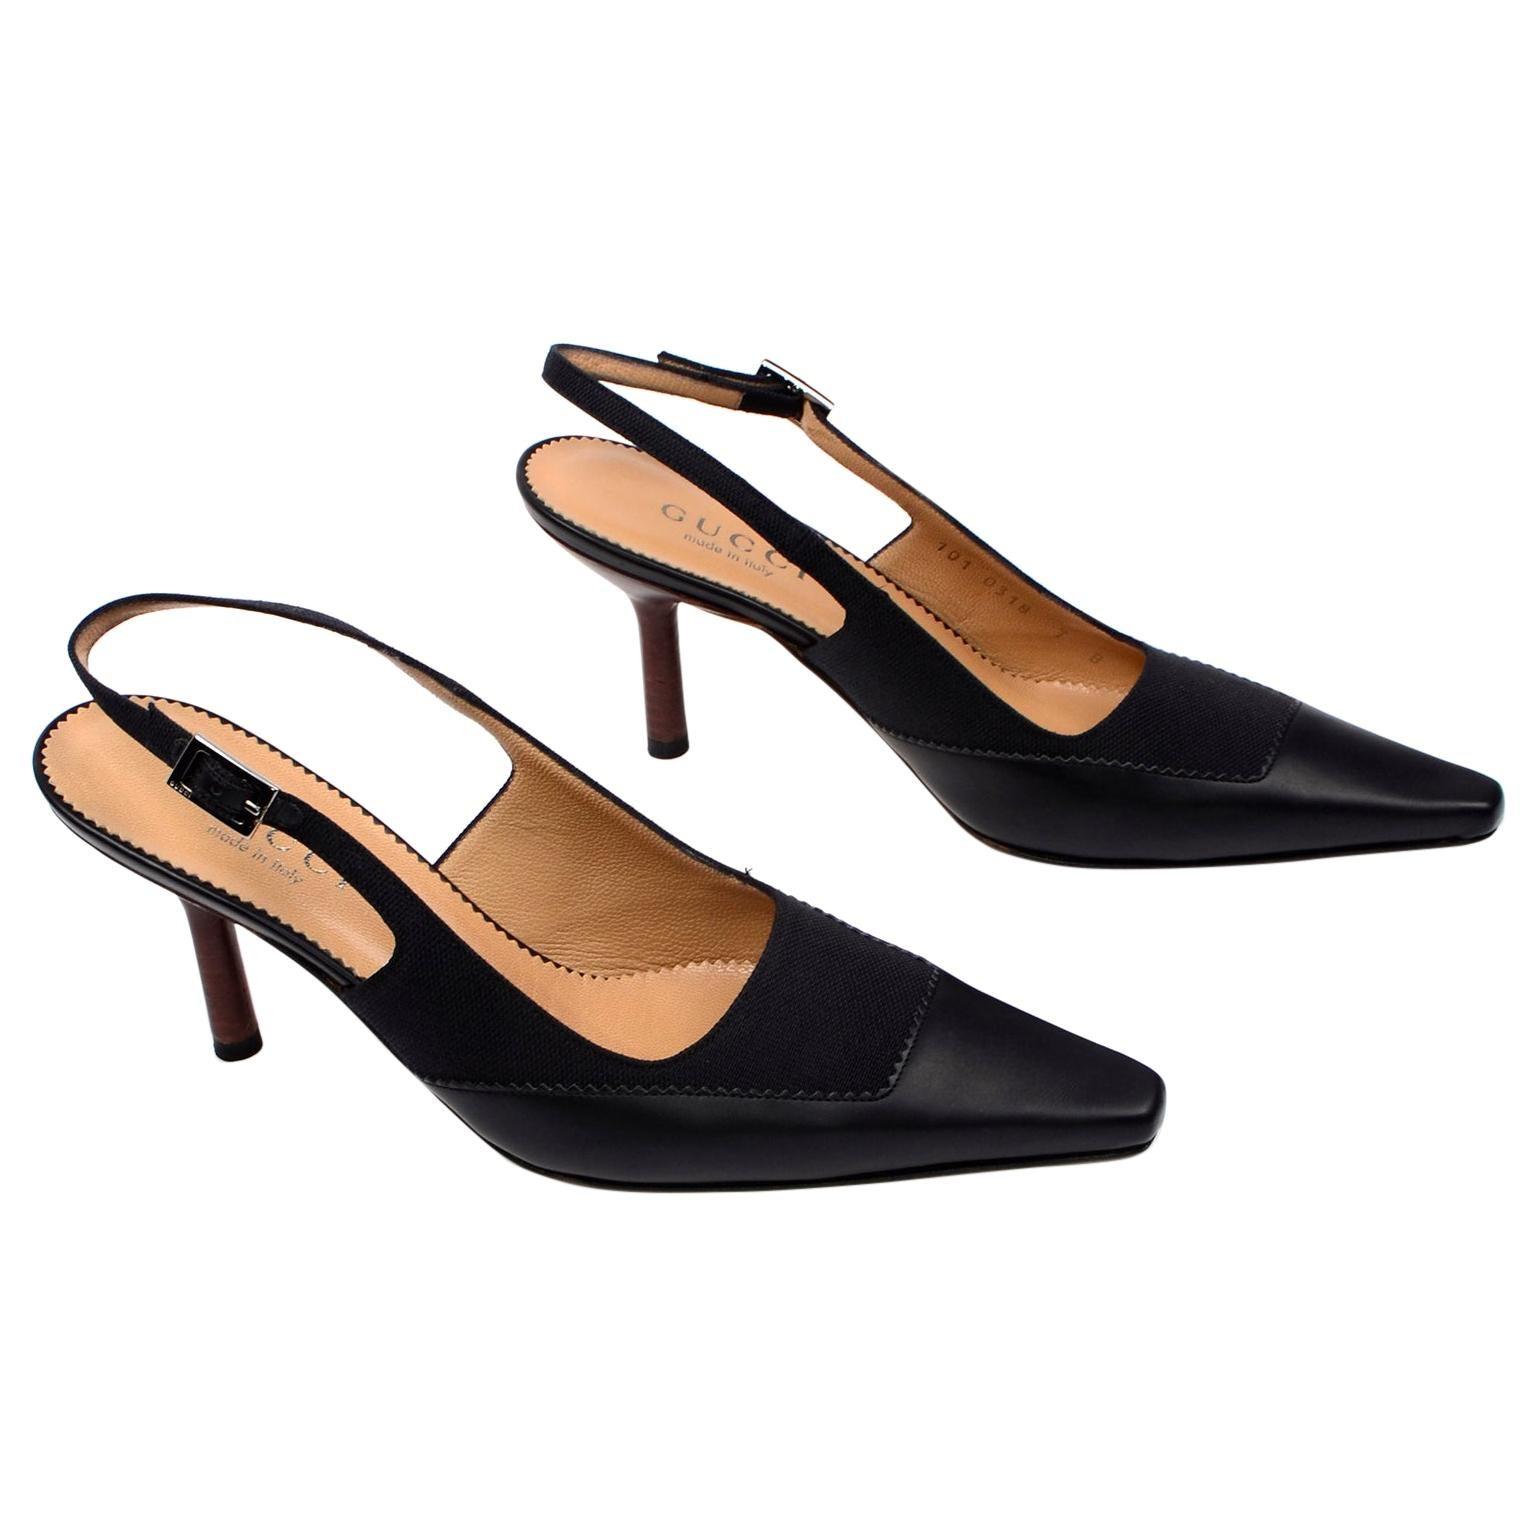 Gucci Vintage Slingback Black Leather & Canvas Heels Shoes 7b